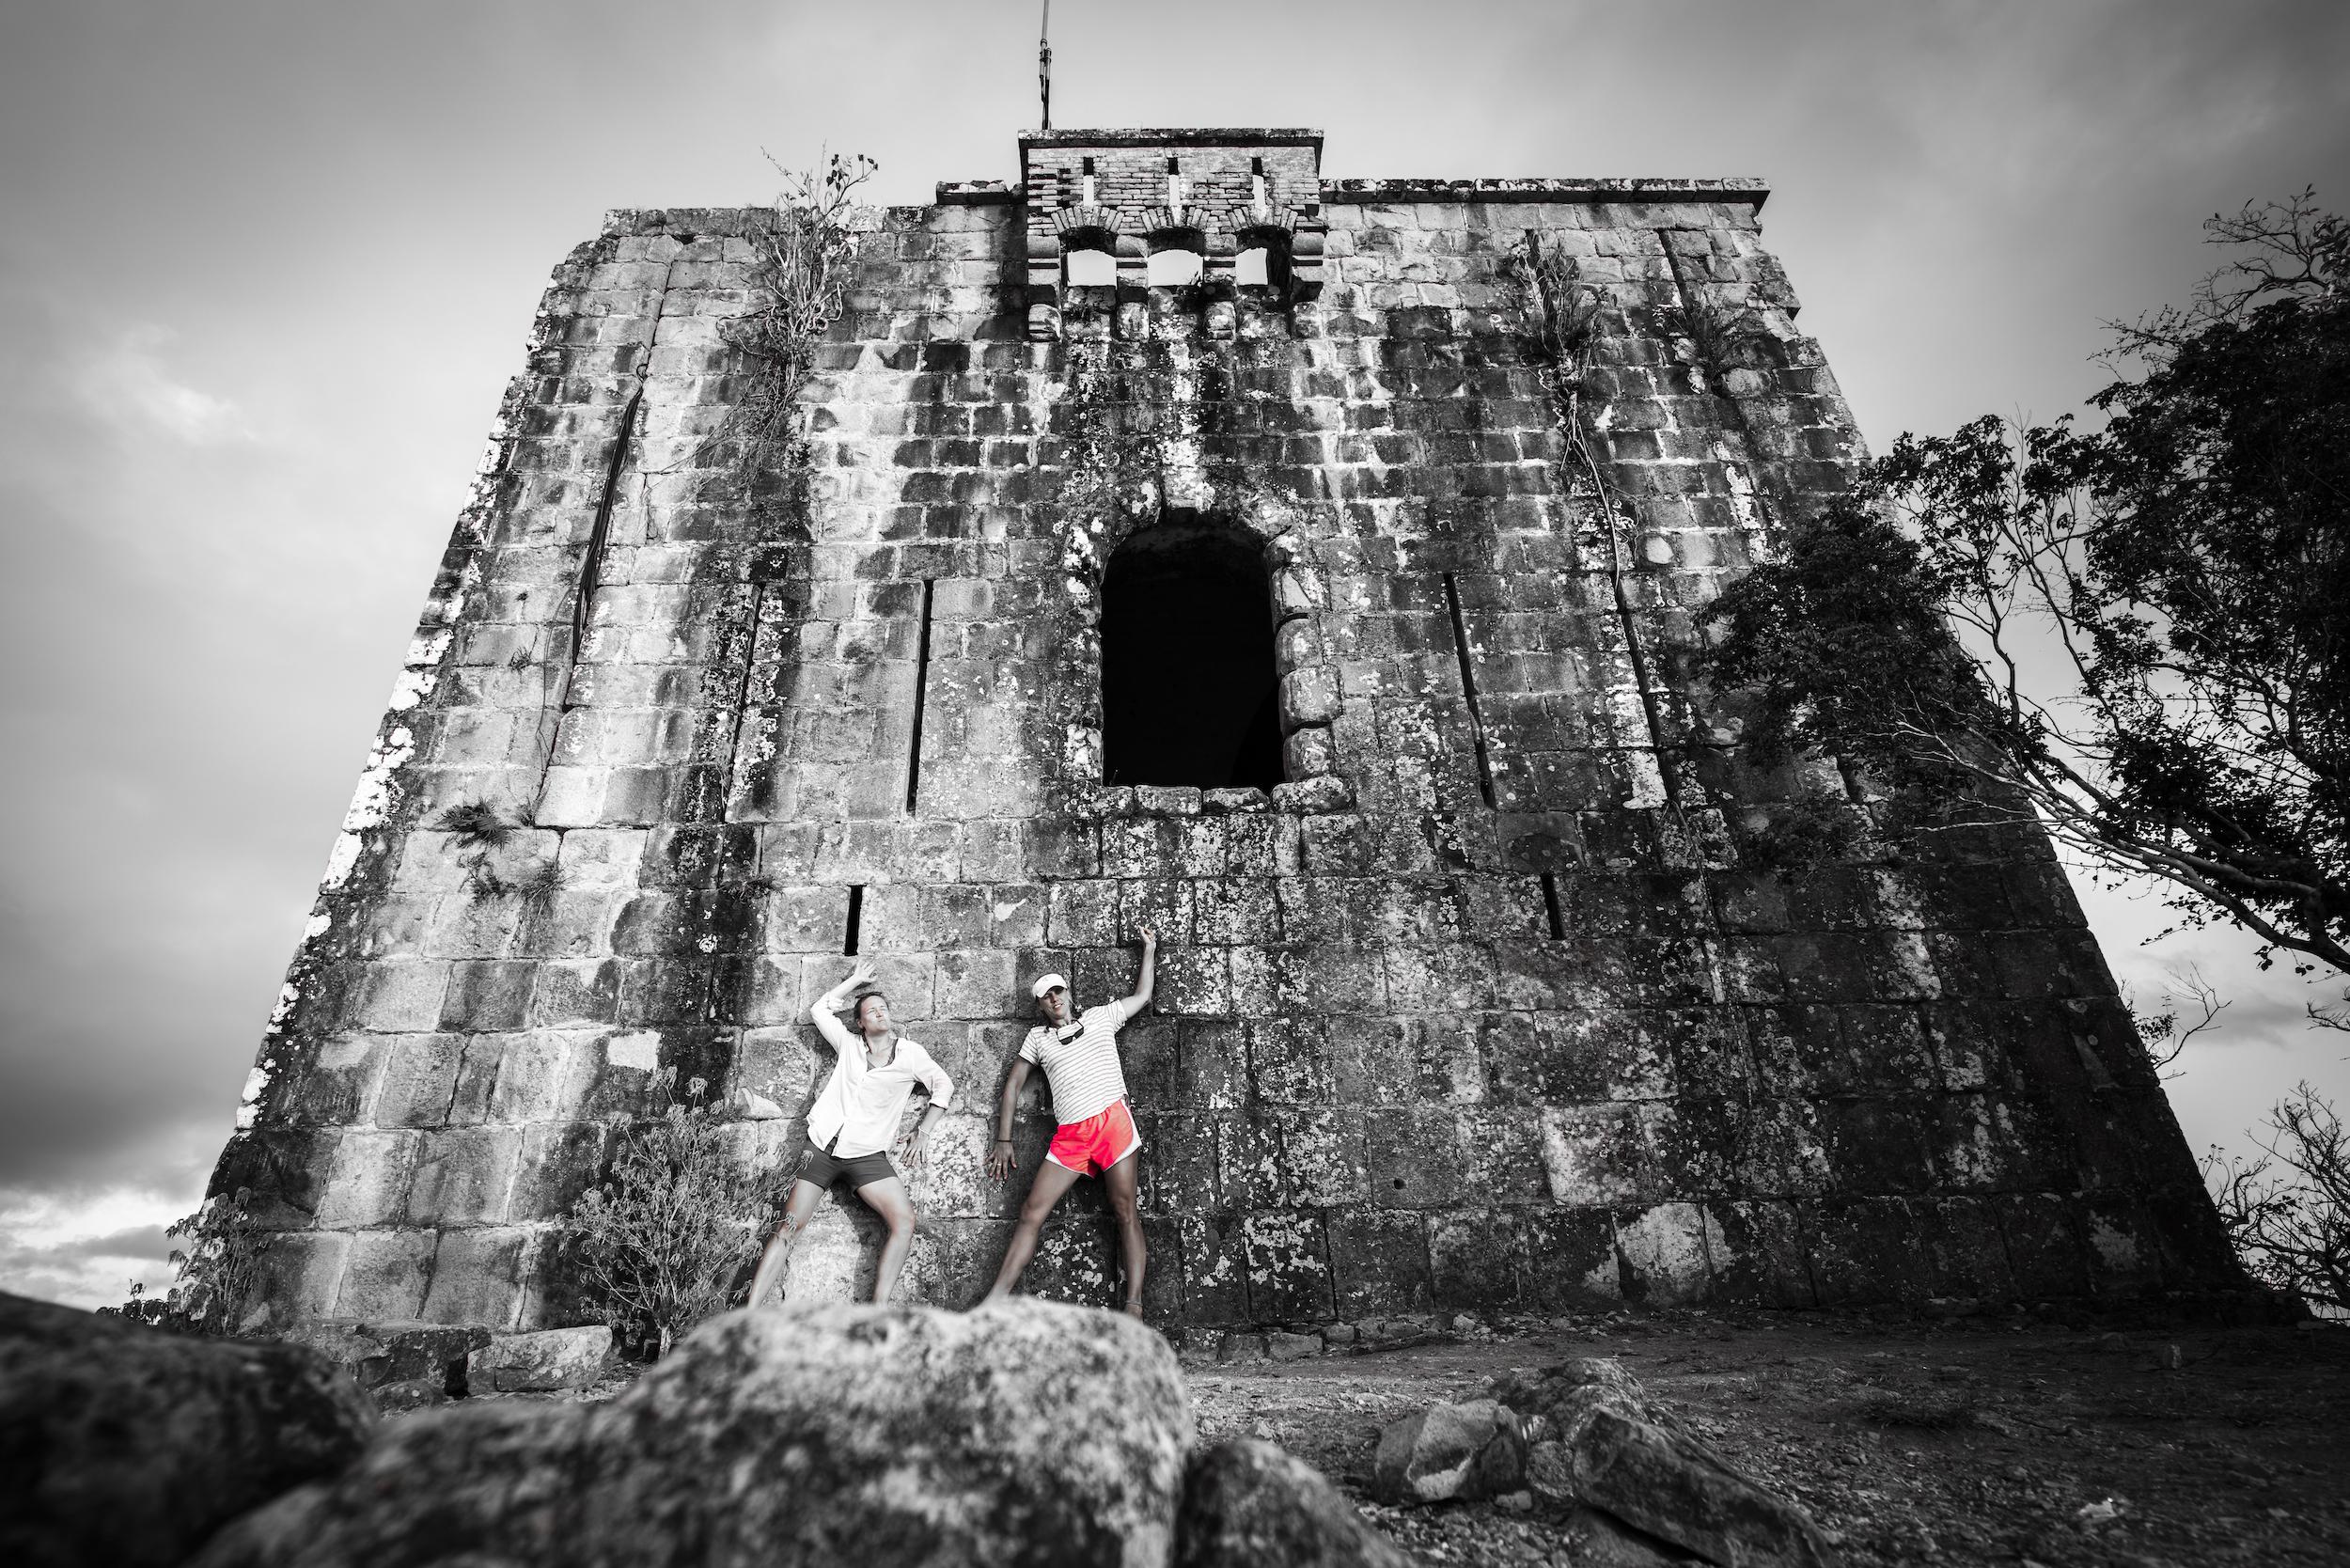 19.03.17Windy Castle Carib_Small.jpg